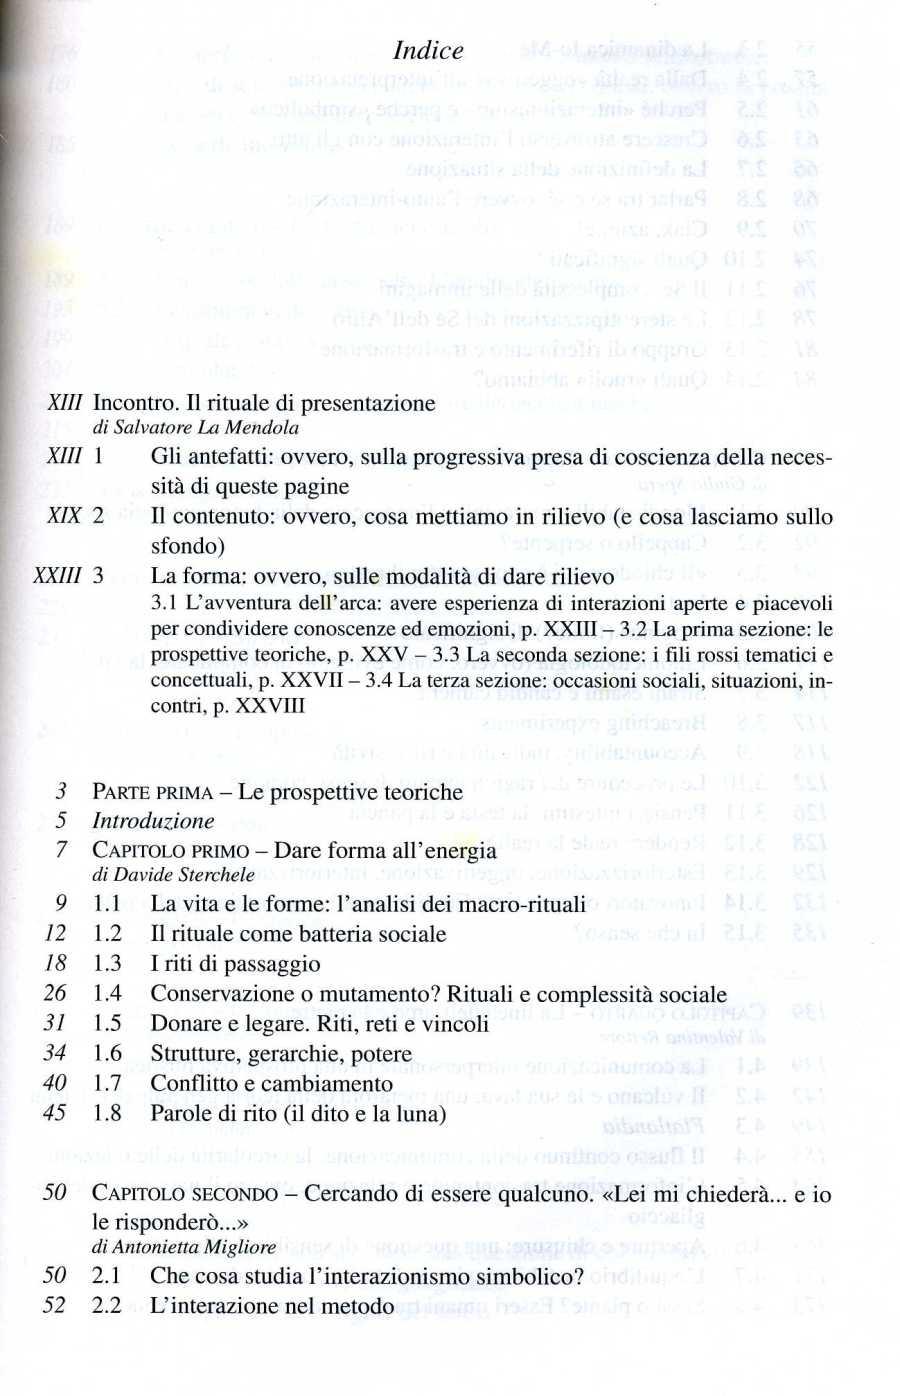 mendola2577